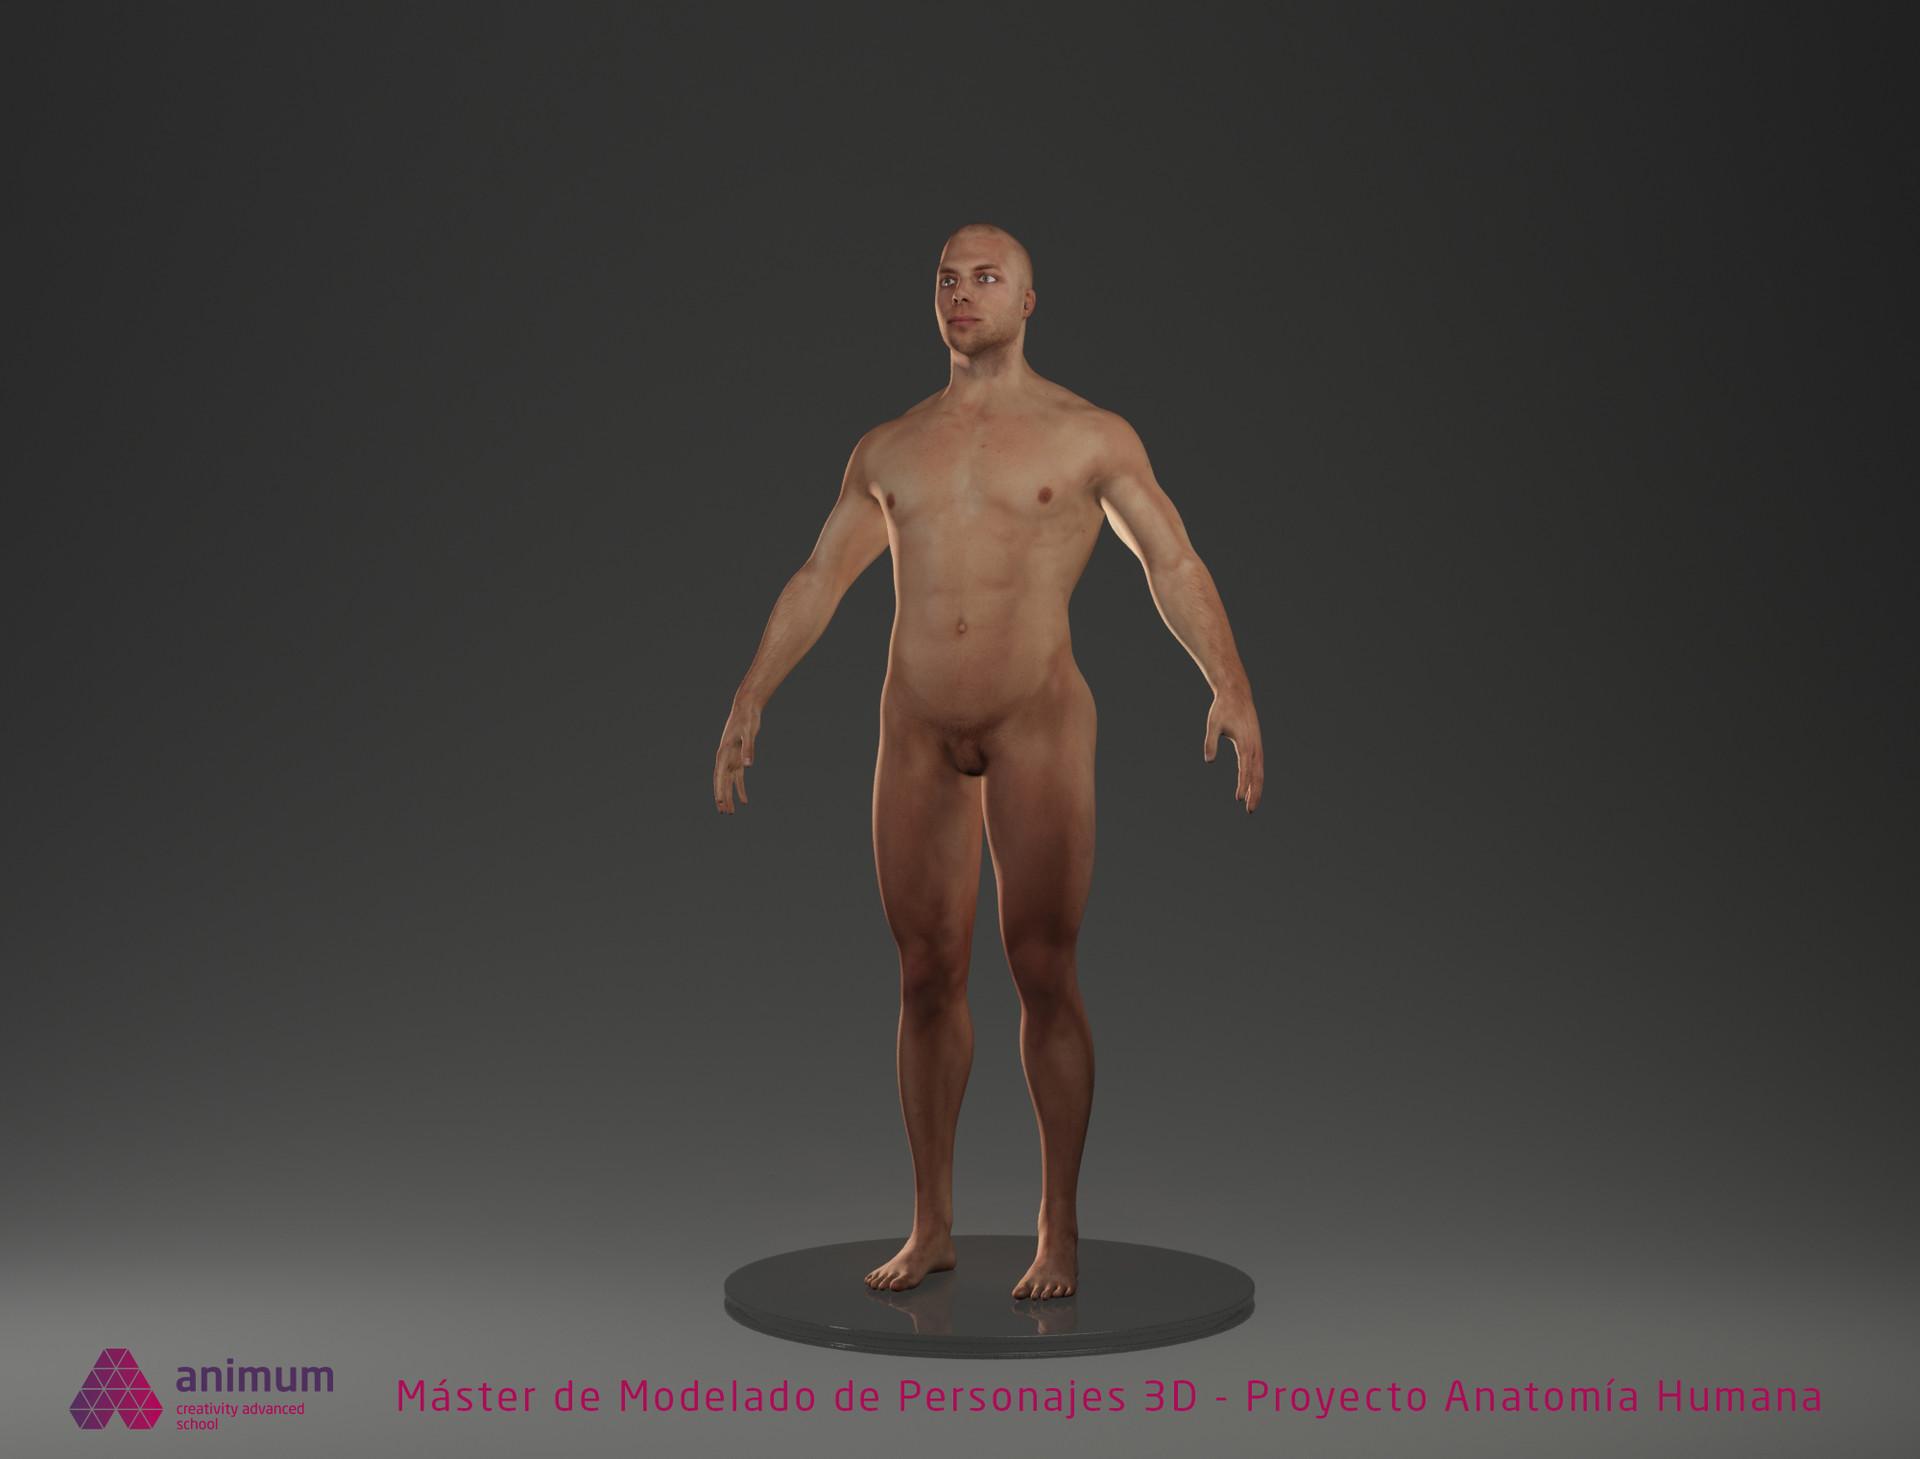 ArtStation - Proyecto anatomía humana, Marcos Lemus